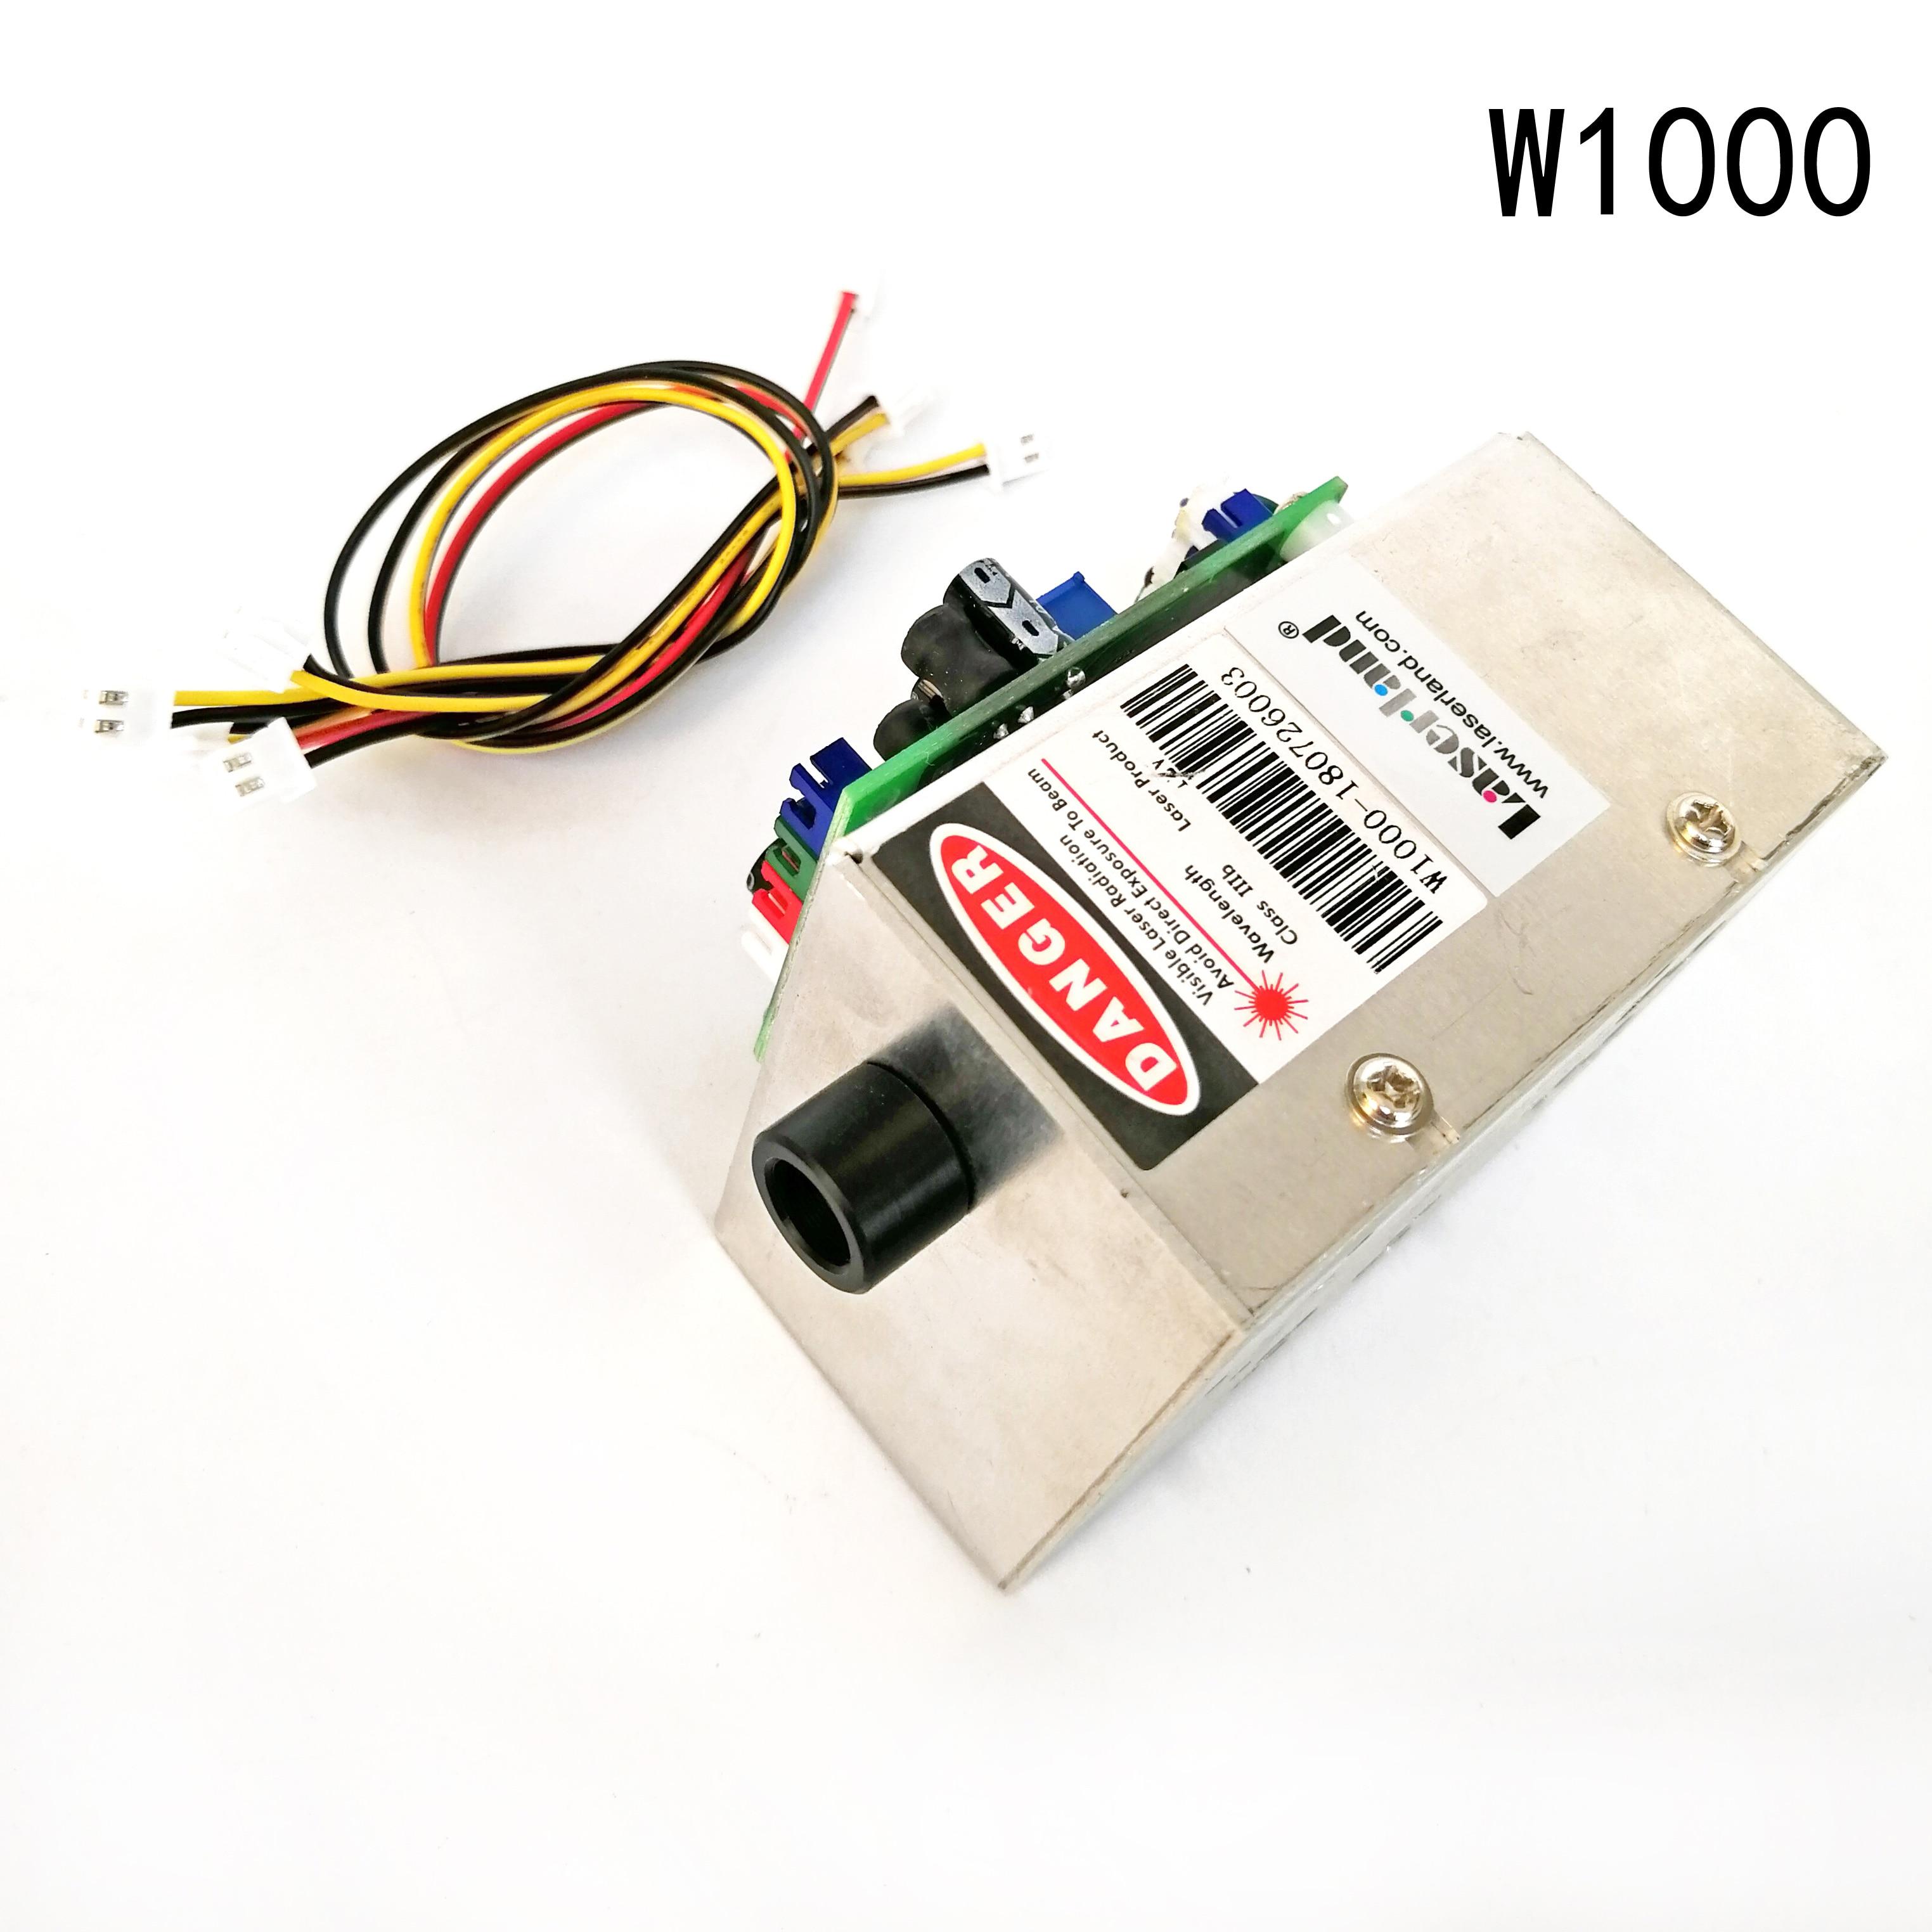 RGB 0.8W Laser Module Red 638nm 180mw Green 505nm 100mw Blue 450nm 520mw Combined Laser Module TTL White Laser